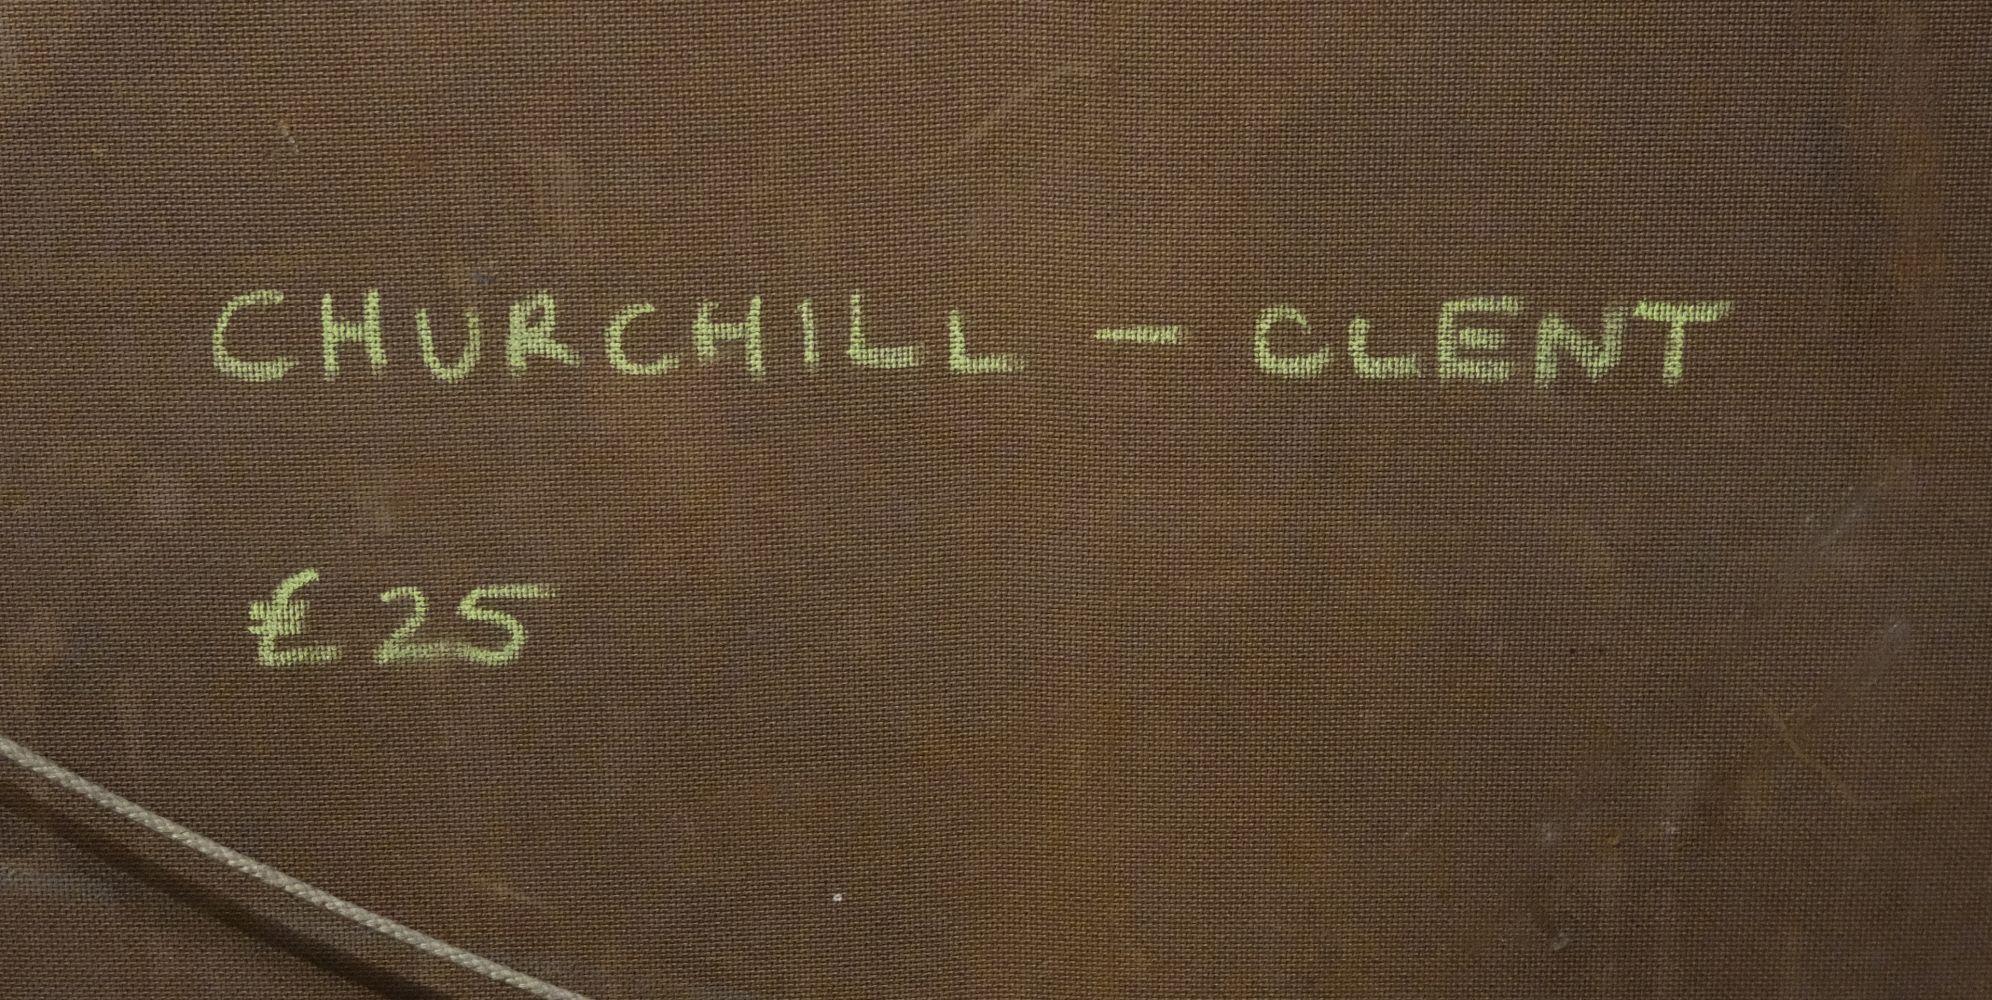 ARR * § Prentice (David, 1936-2014). Churchill-Clent, 1964 - Image 9 of 10